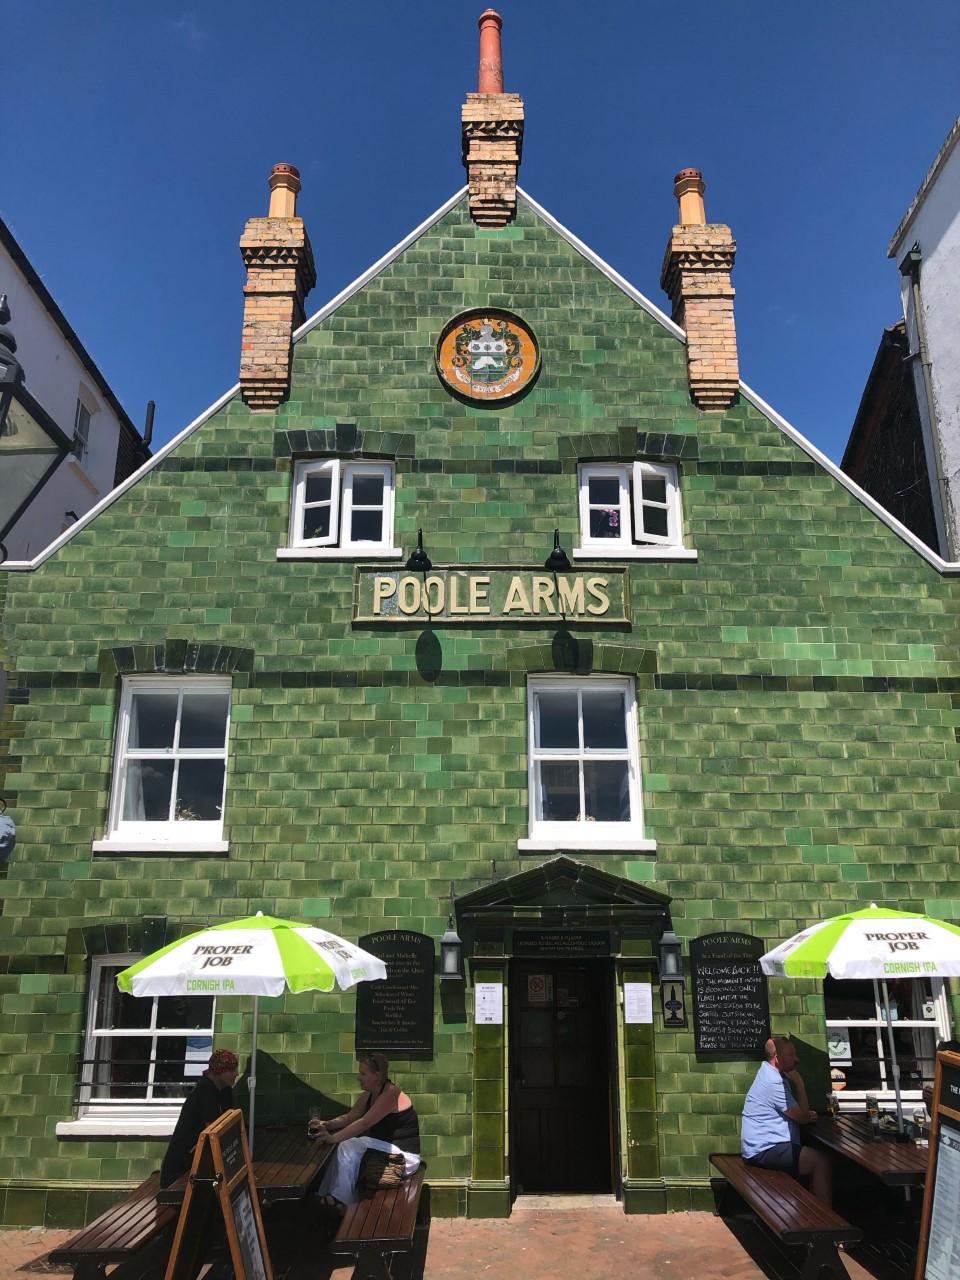 Poole history Poole Arms